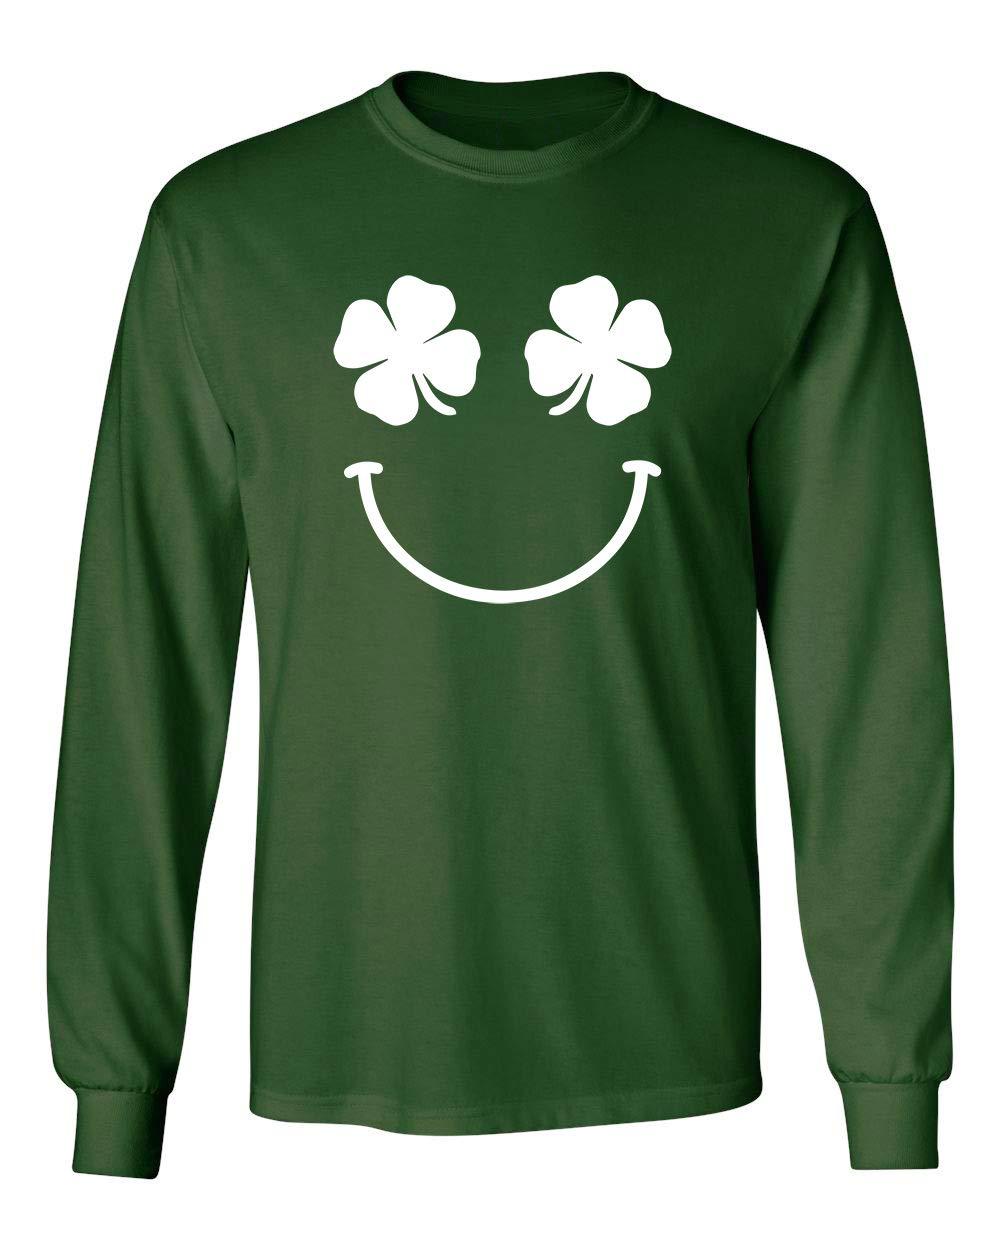 Clover Face St Patrick S Day Saint Irish Pats Sarcastic Funny T Shirt